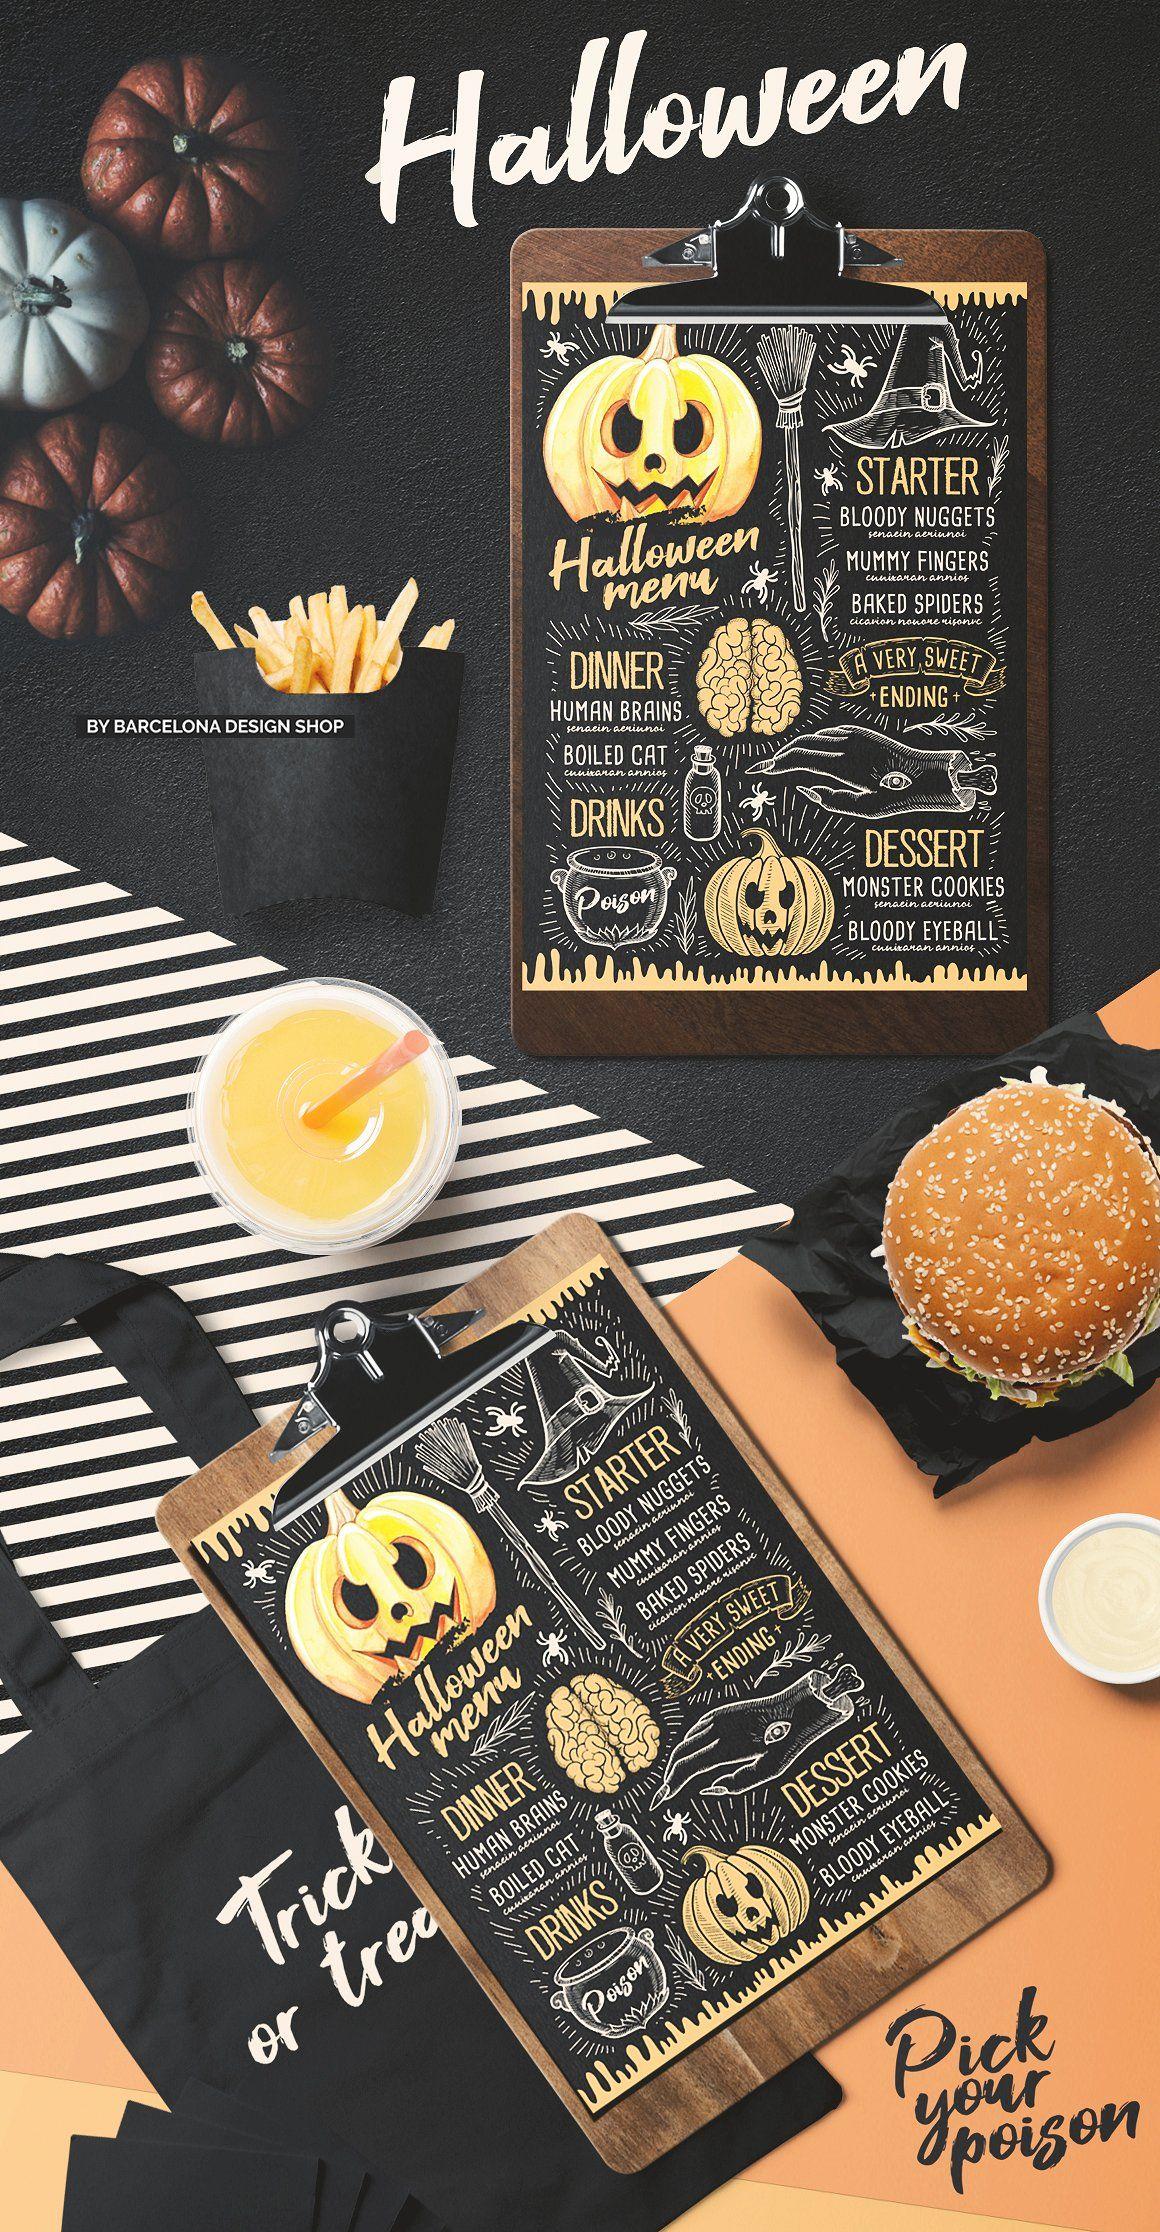 Halloween Party Food Menu Halloween Food For Party Party Food Menu Halloween Party Menu